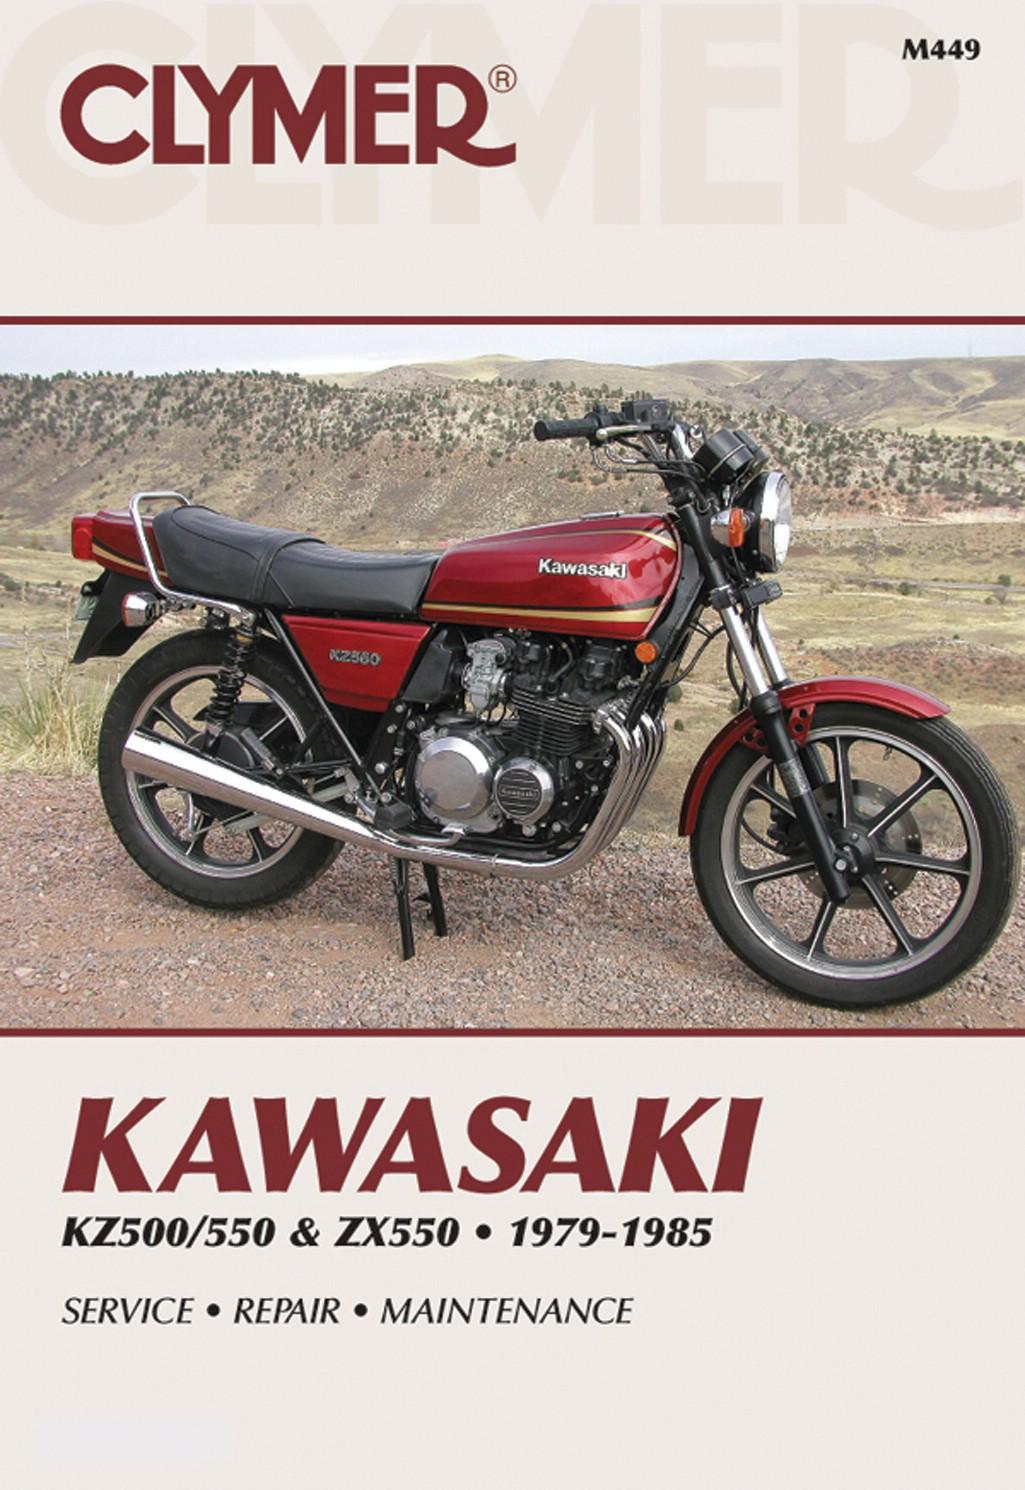 Kawasaki Gpz 550 H1 Manual 2019 Ebook Library S3 Wiring Diagram Image Is Loading H Kz550h 1982 Manuals